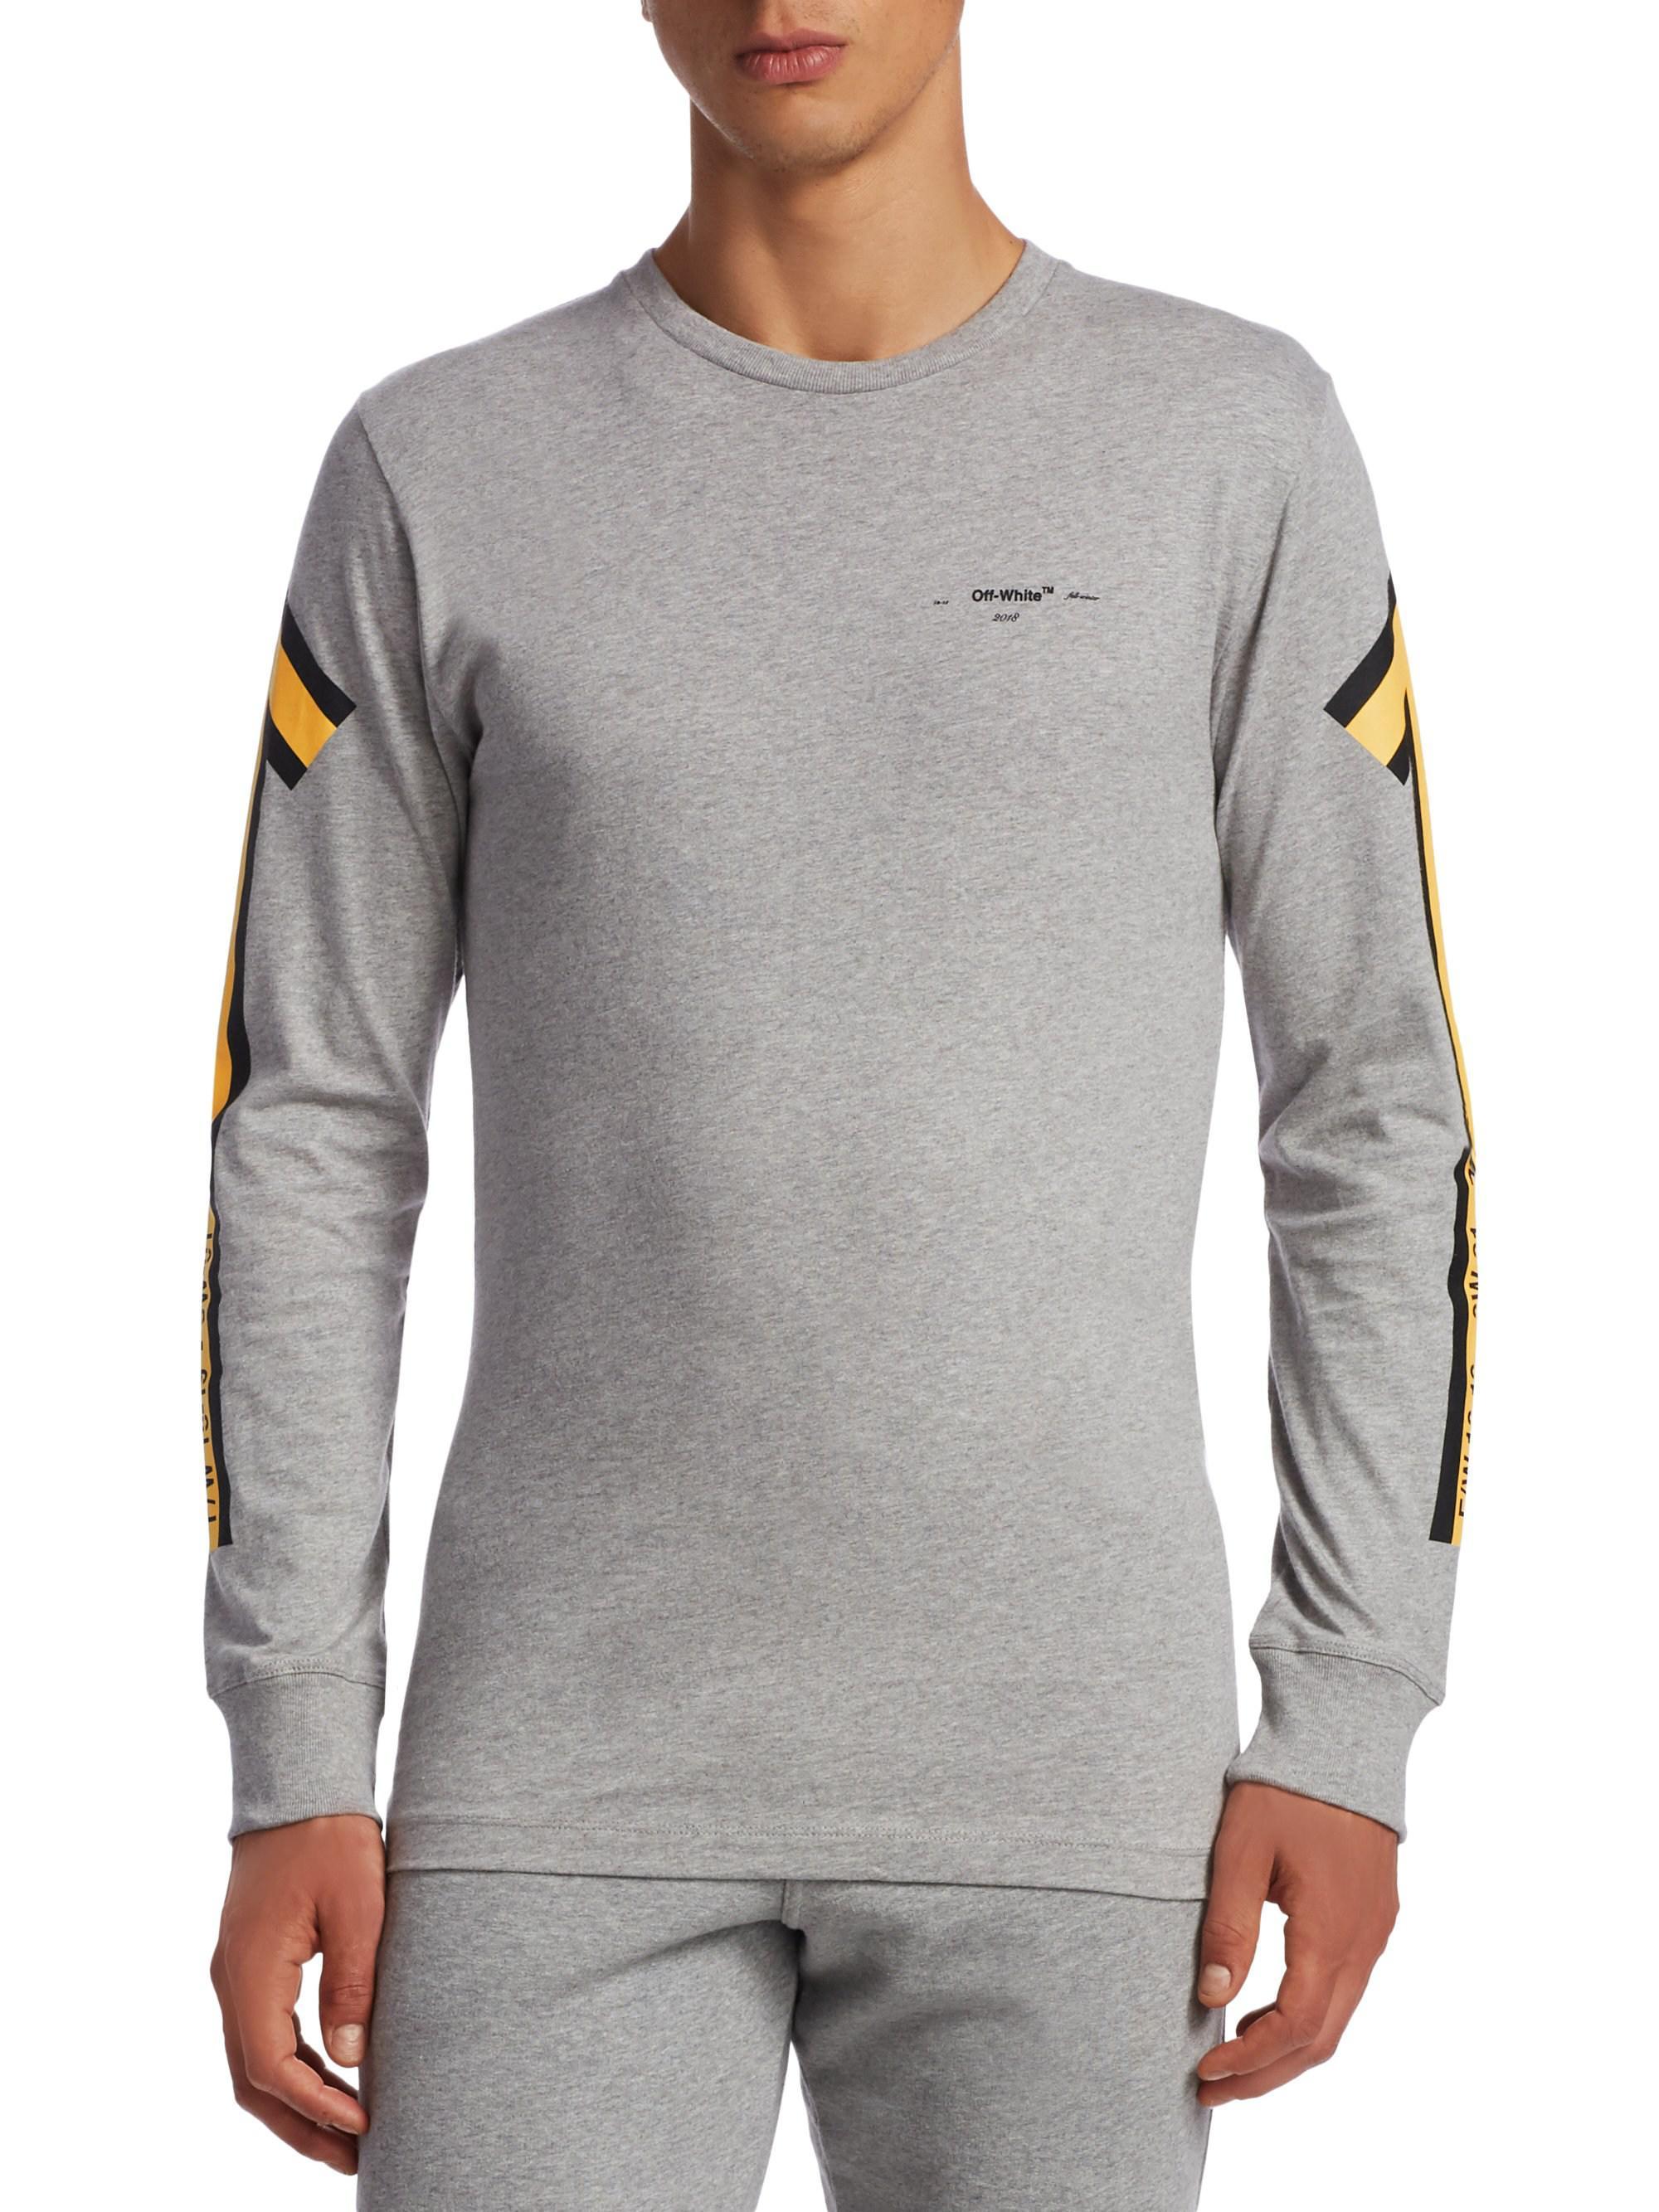 d9848ac621 Off White Arrows Long Sleeve T Shirt - raveitsafe